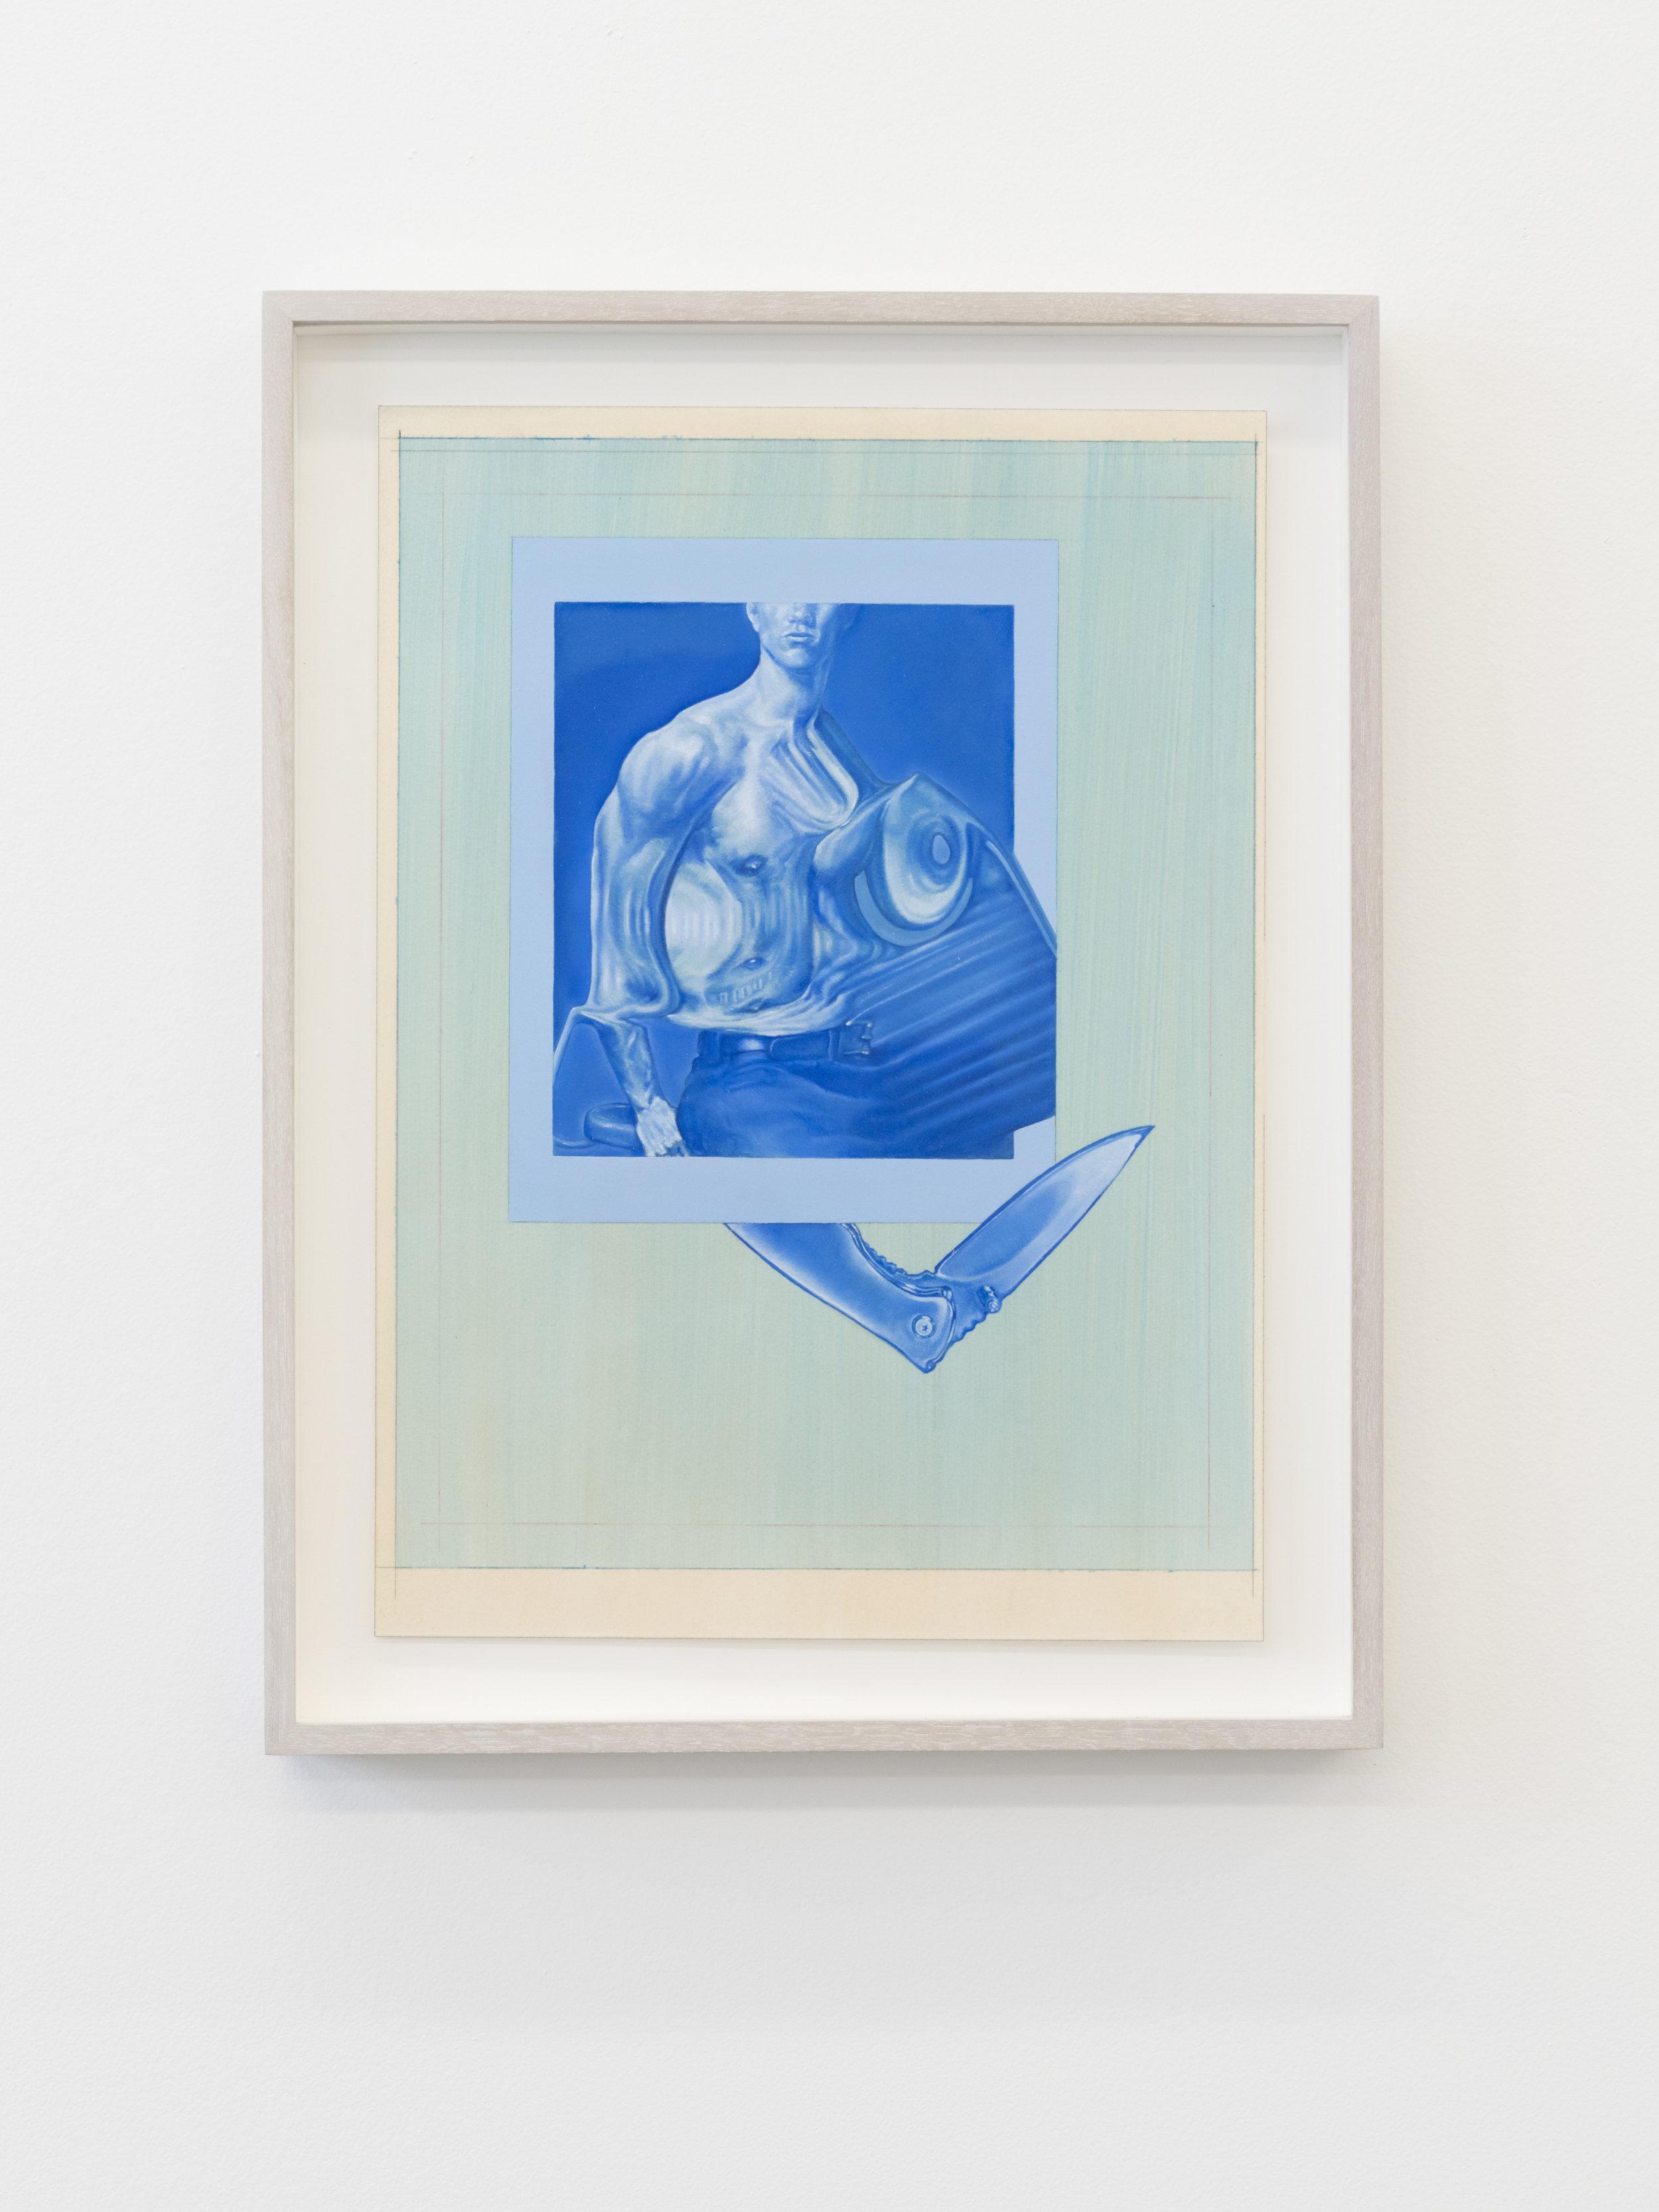 David Lasley   Mr. Titty Twister , 2018  Oil on paper  10 x 14 in, 12.5 x 16.5 in framed